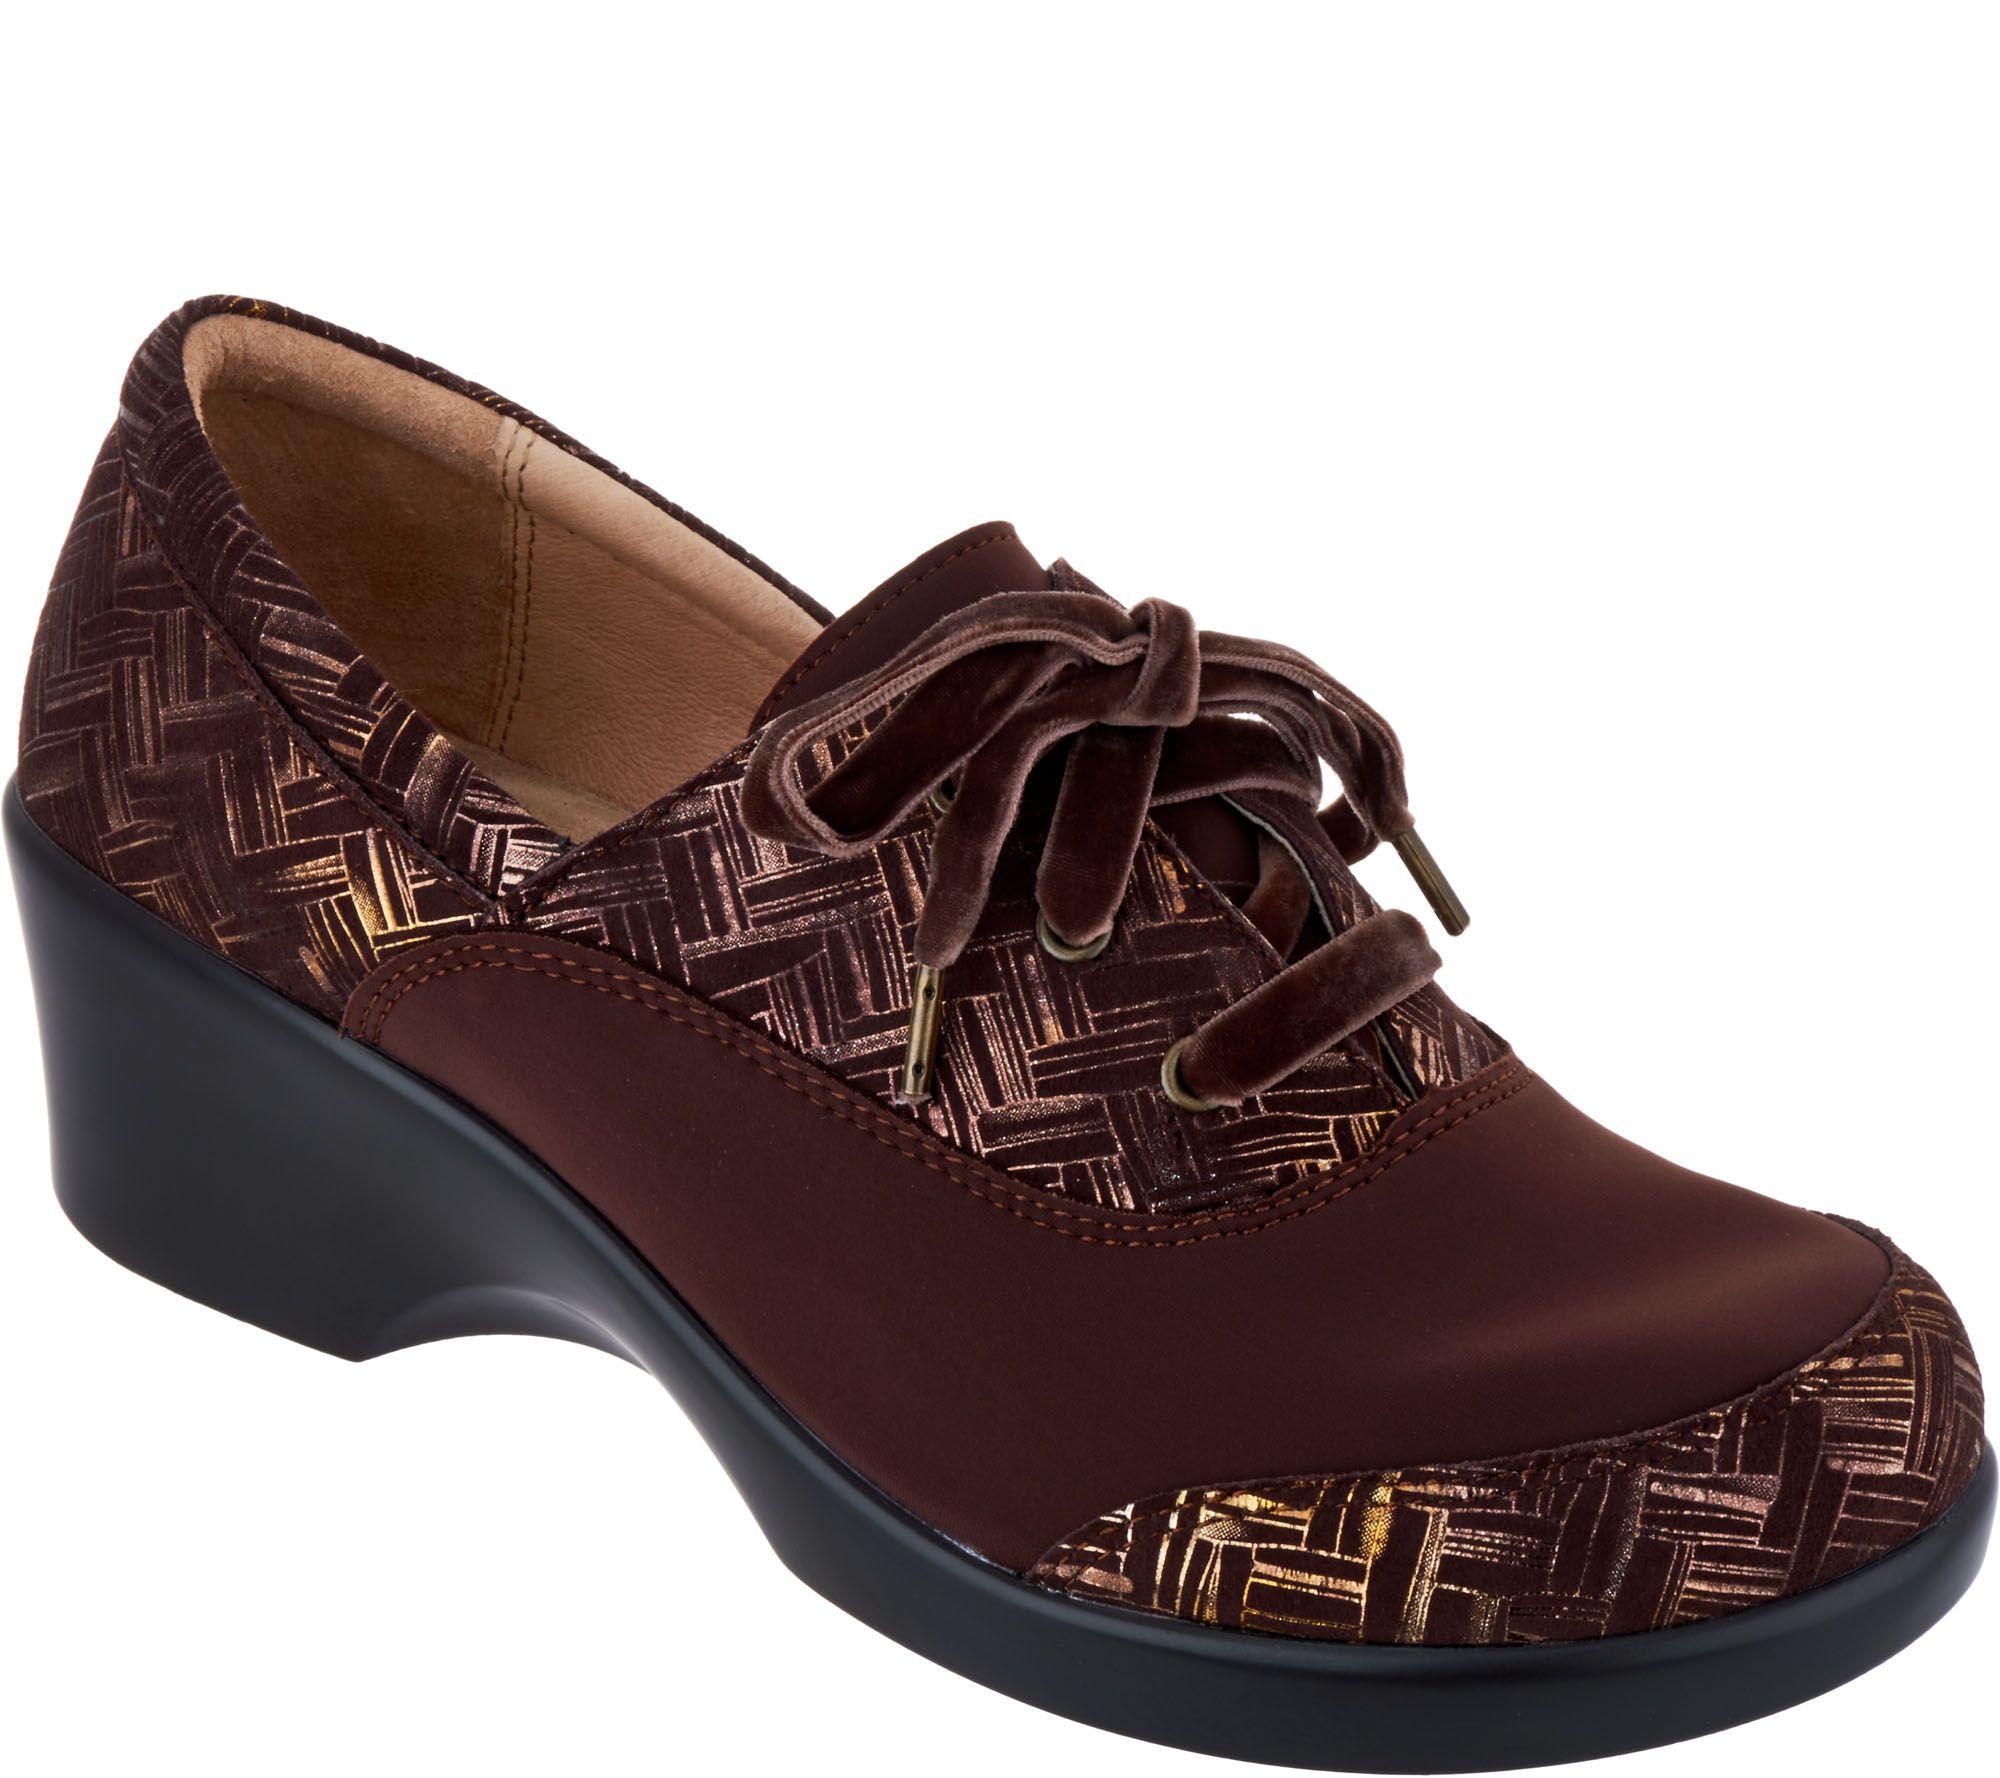 comfortable comforter nurse shoes for nursing women top